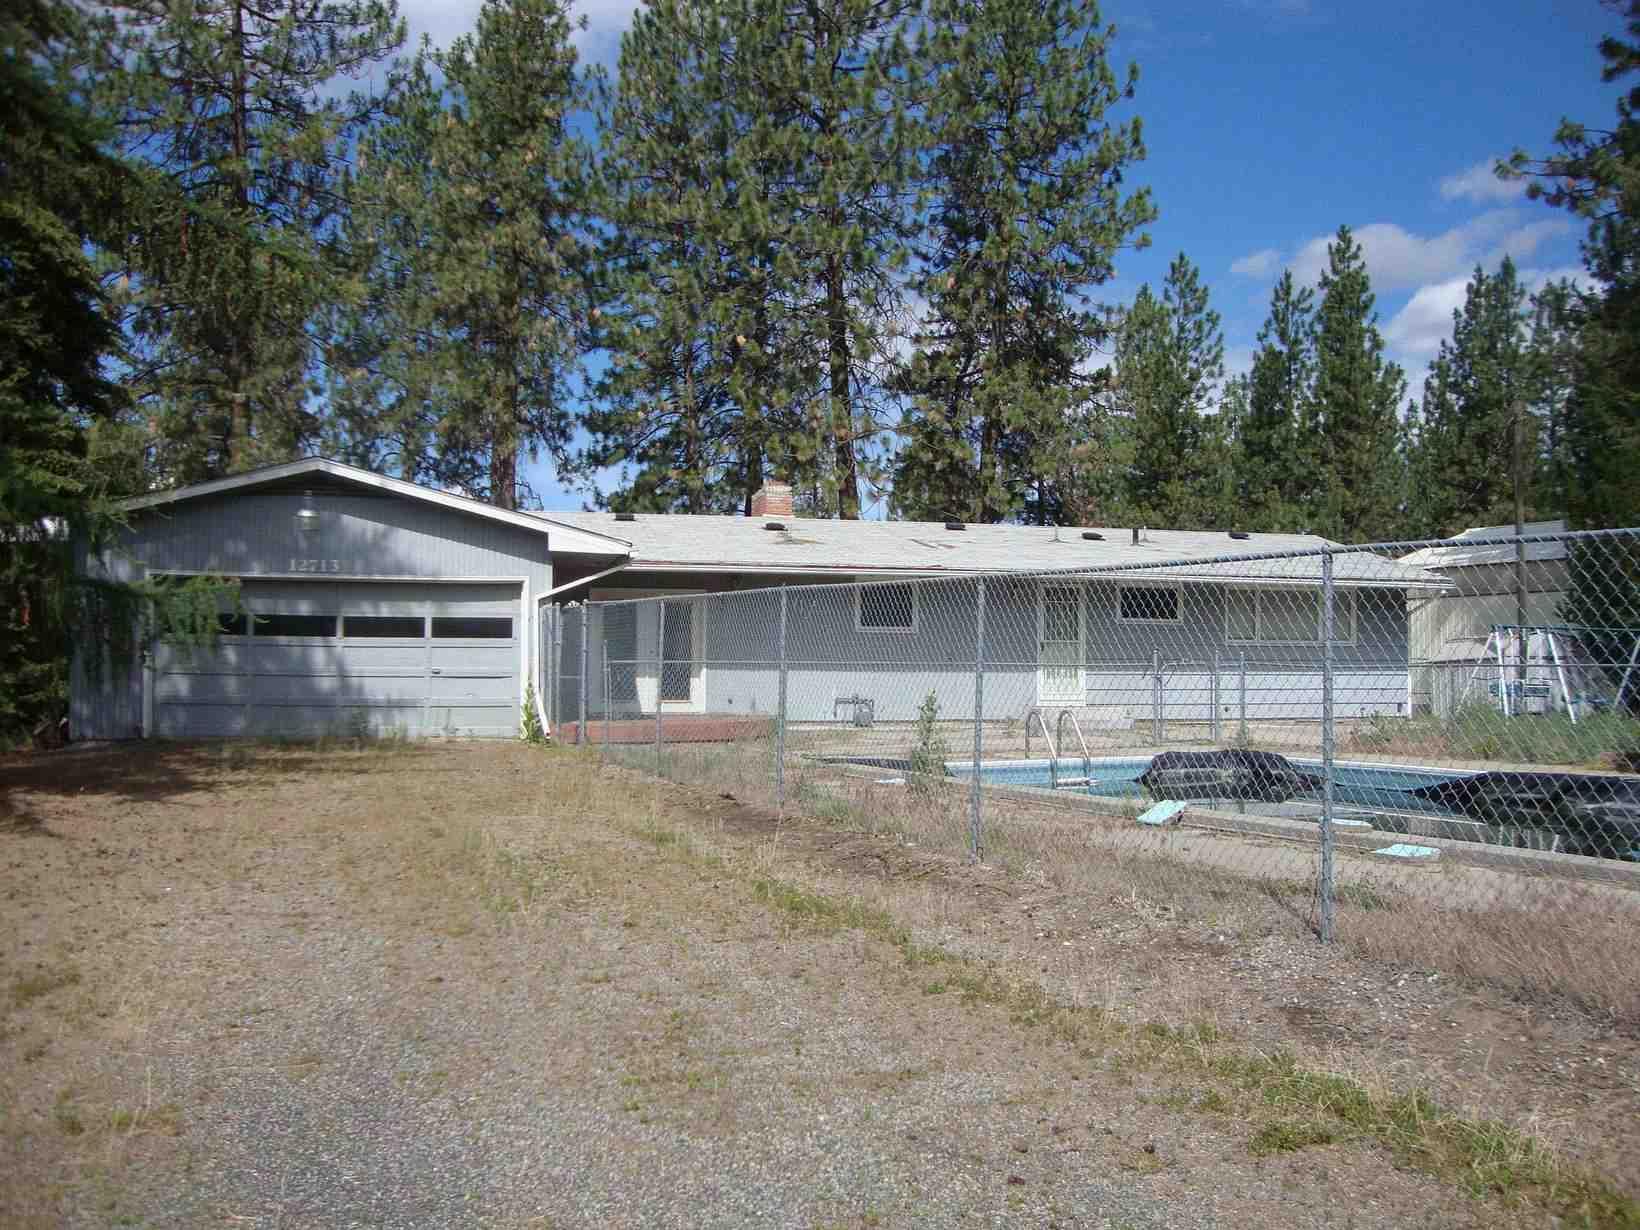 12713 N Hamilton St, Spokane in  County, WA 99218 Home for Sale